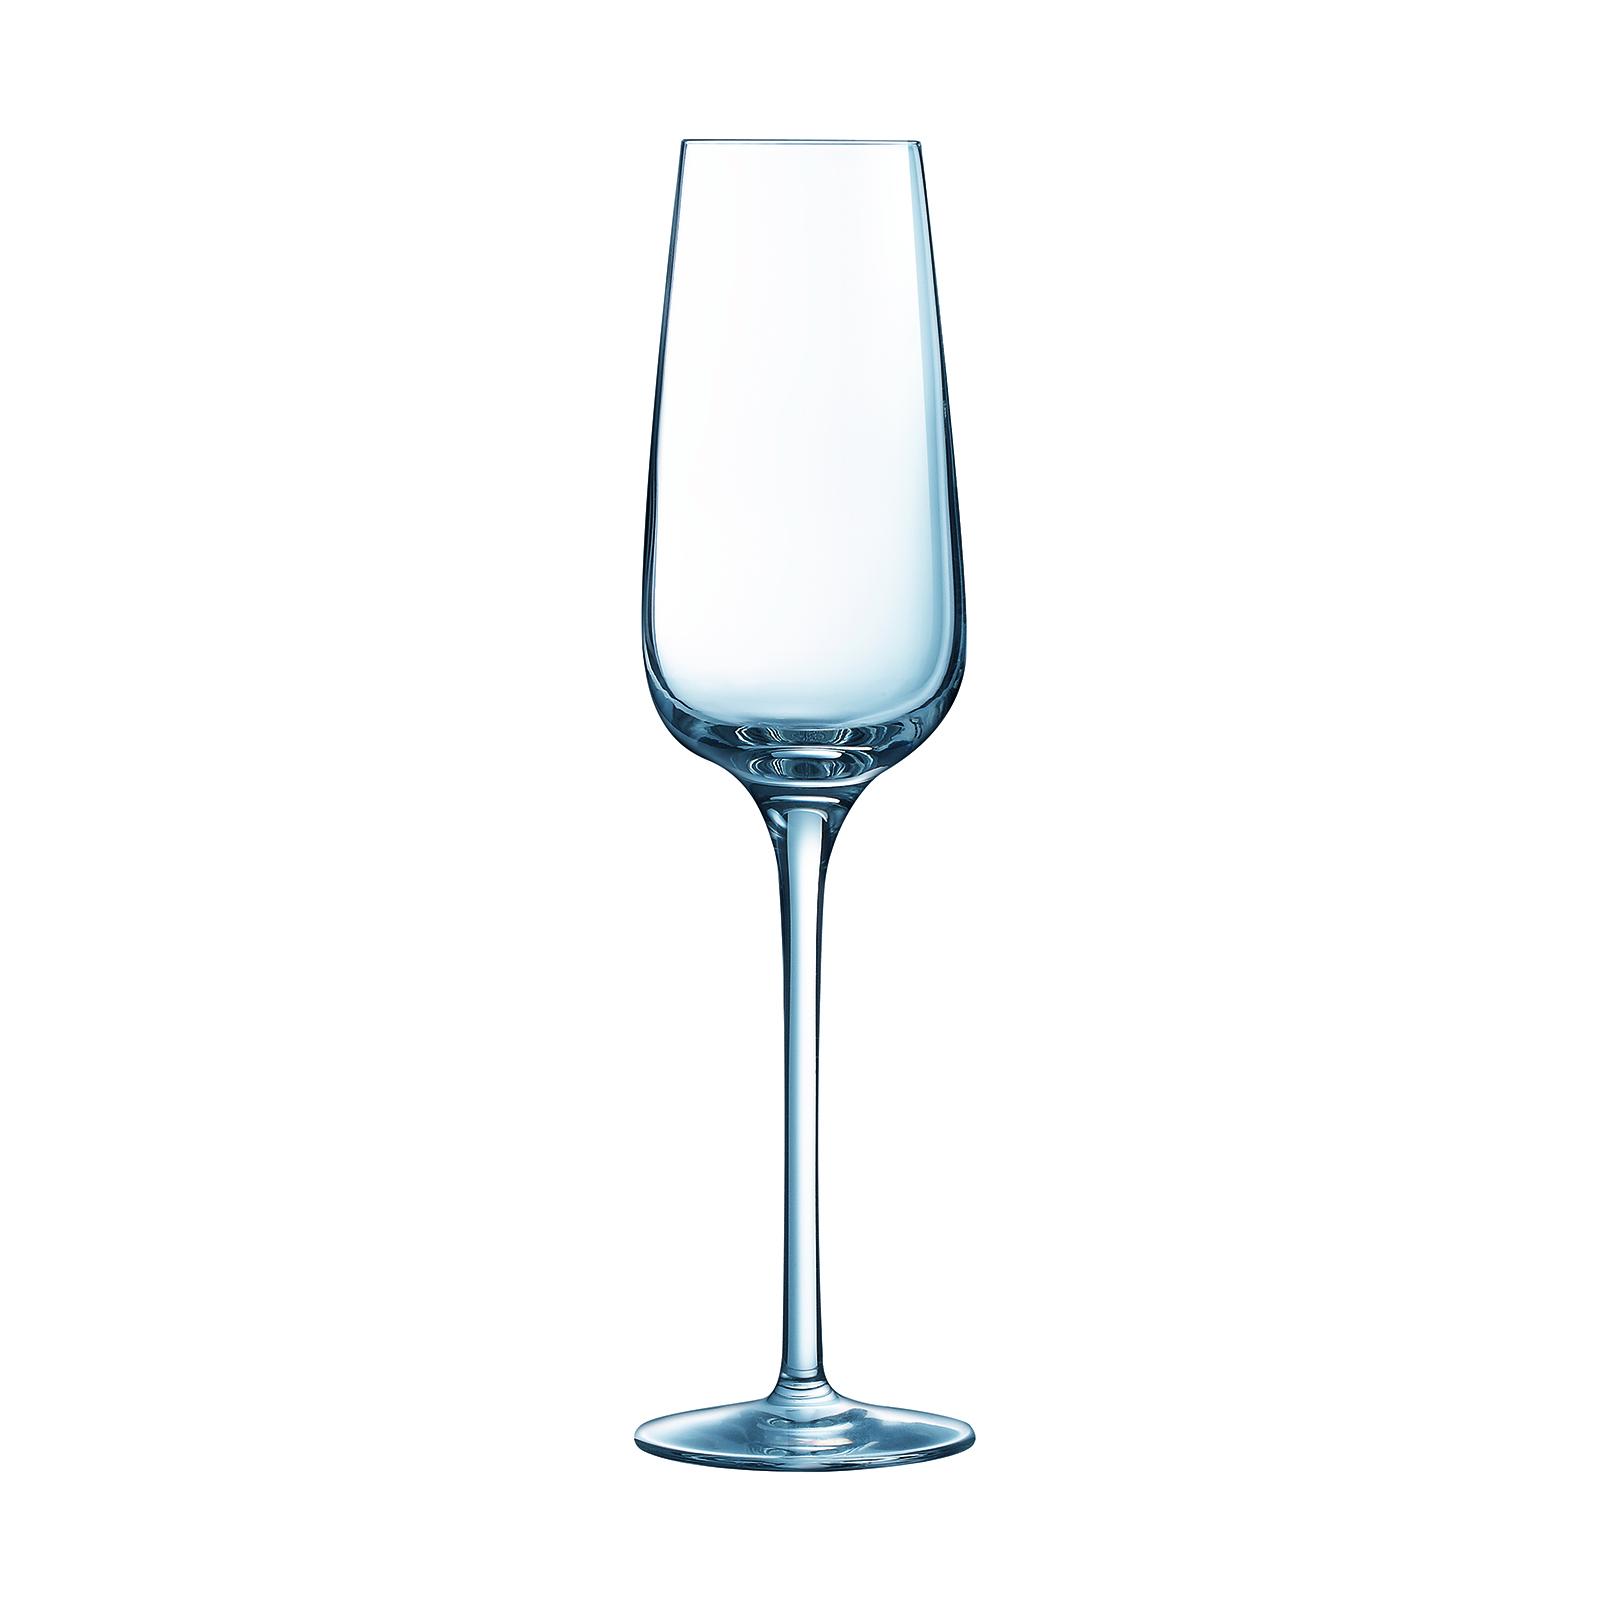 Cardinal L2762 glass, champagne / sparkling wine